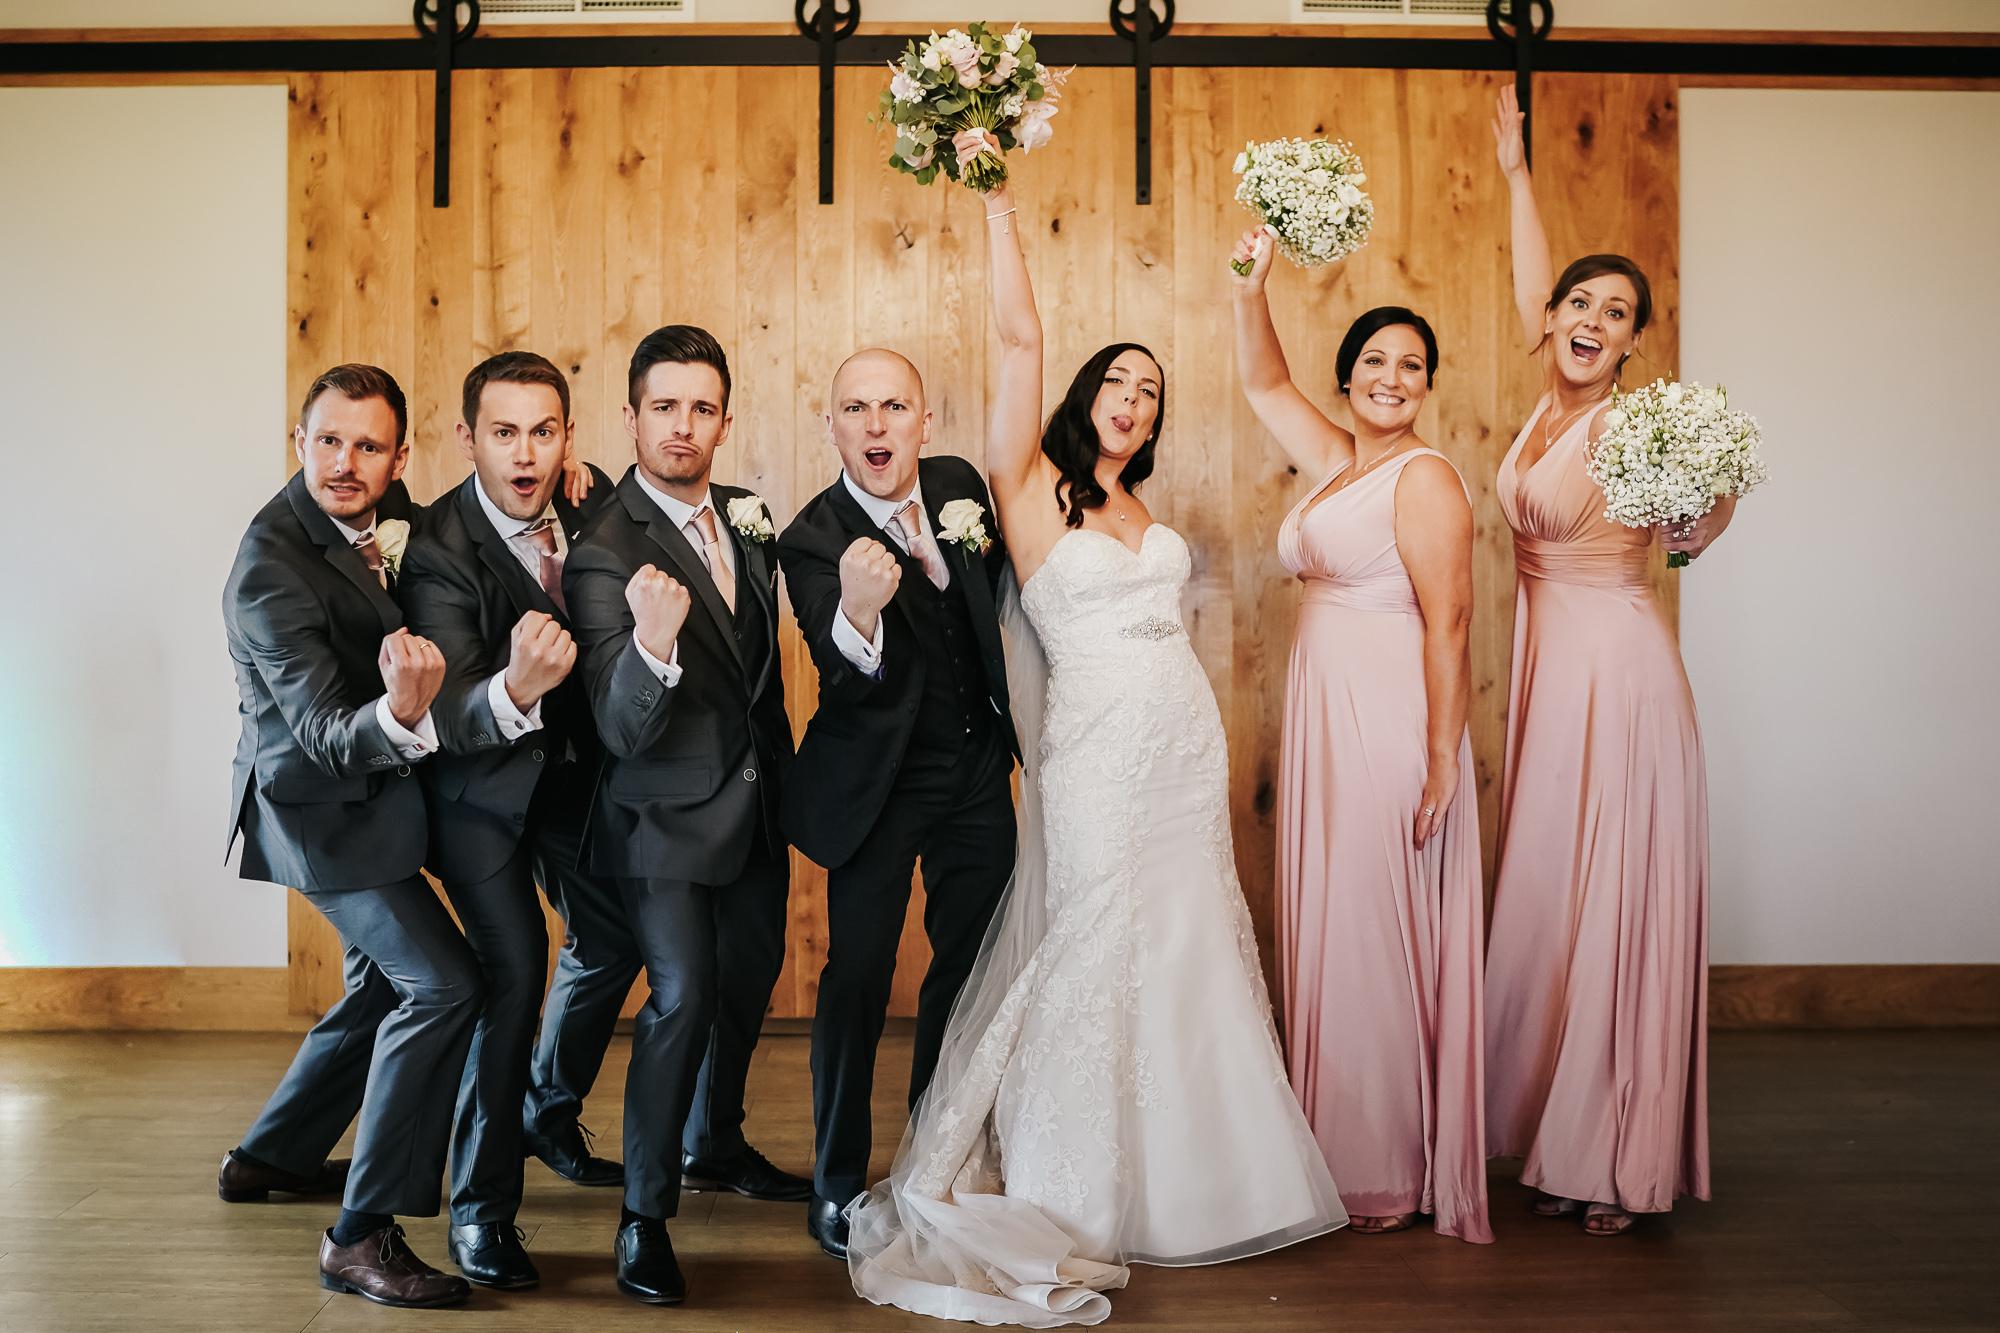 Hyde Bank Farm Wedding Photography Manchester wedding photographer (33 of 49).jpg